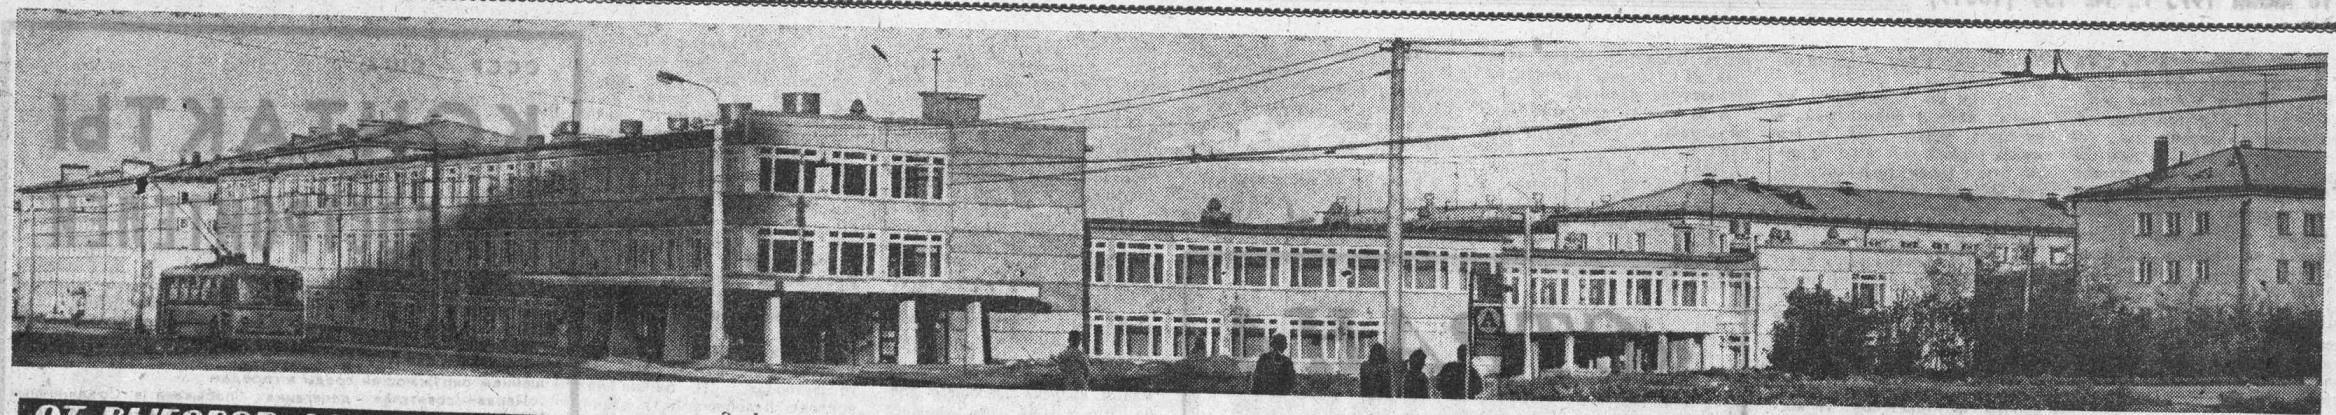 Карбышева-ФОТО-19-ВКа-1973-06-16-новый техникум на АО